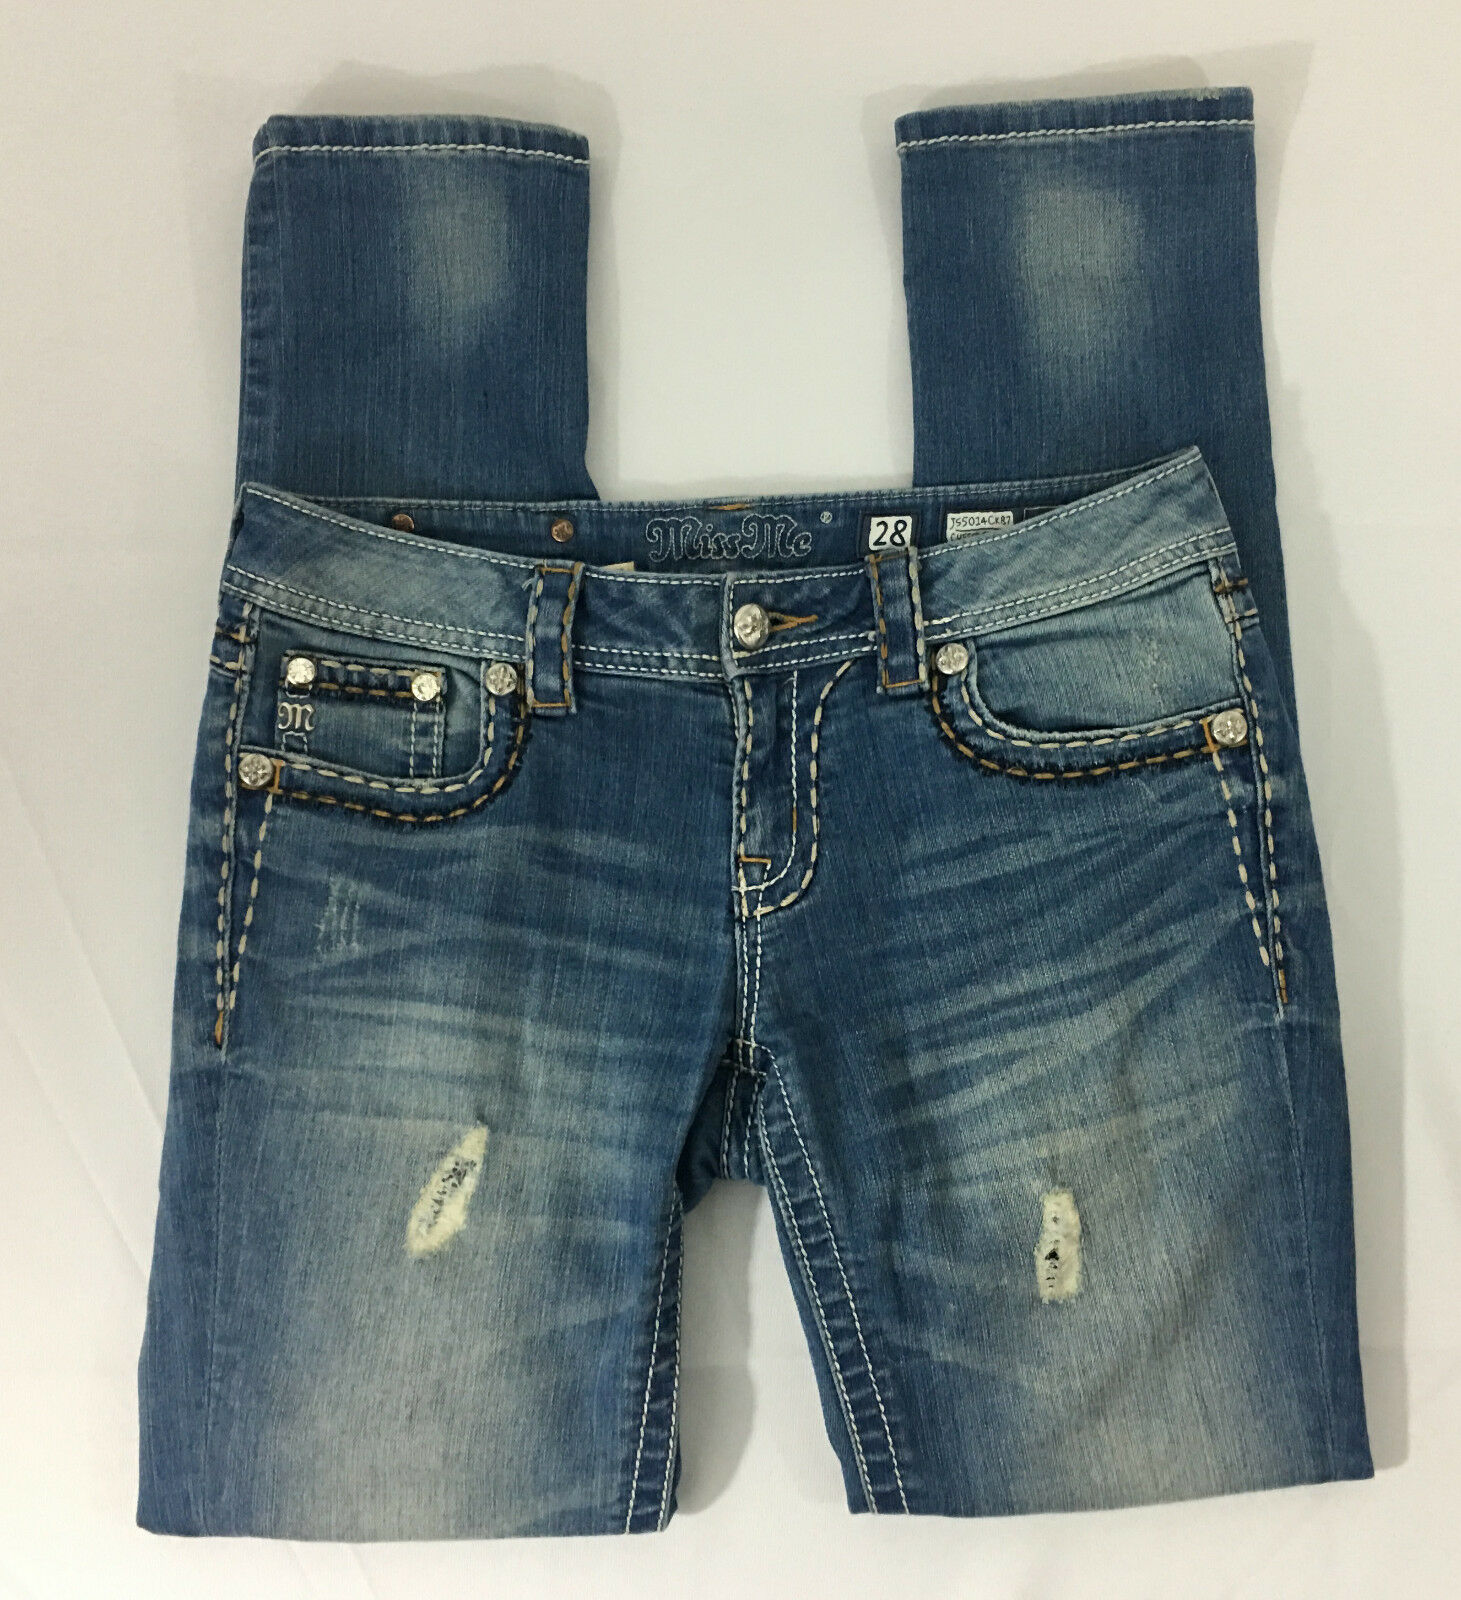 P16 Womens Miss Me Cuffed Skinny Denim Jeans  Sz 28 Embellished